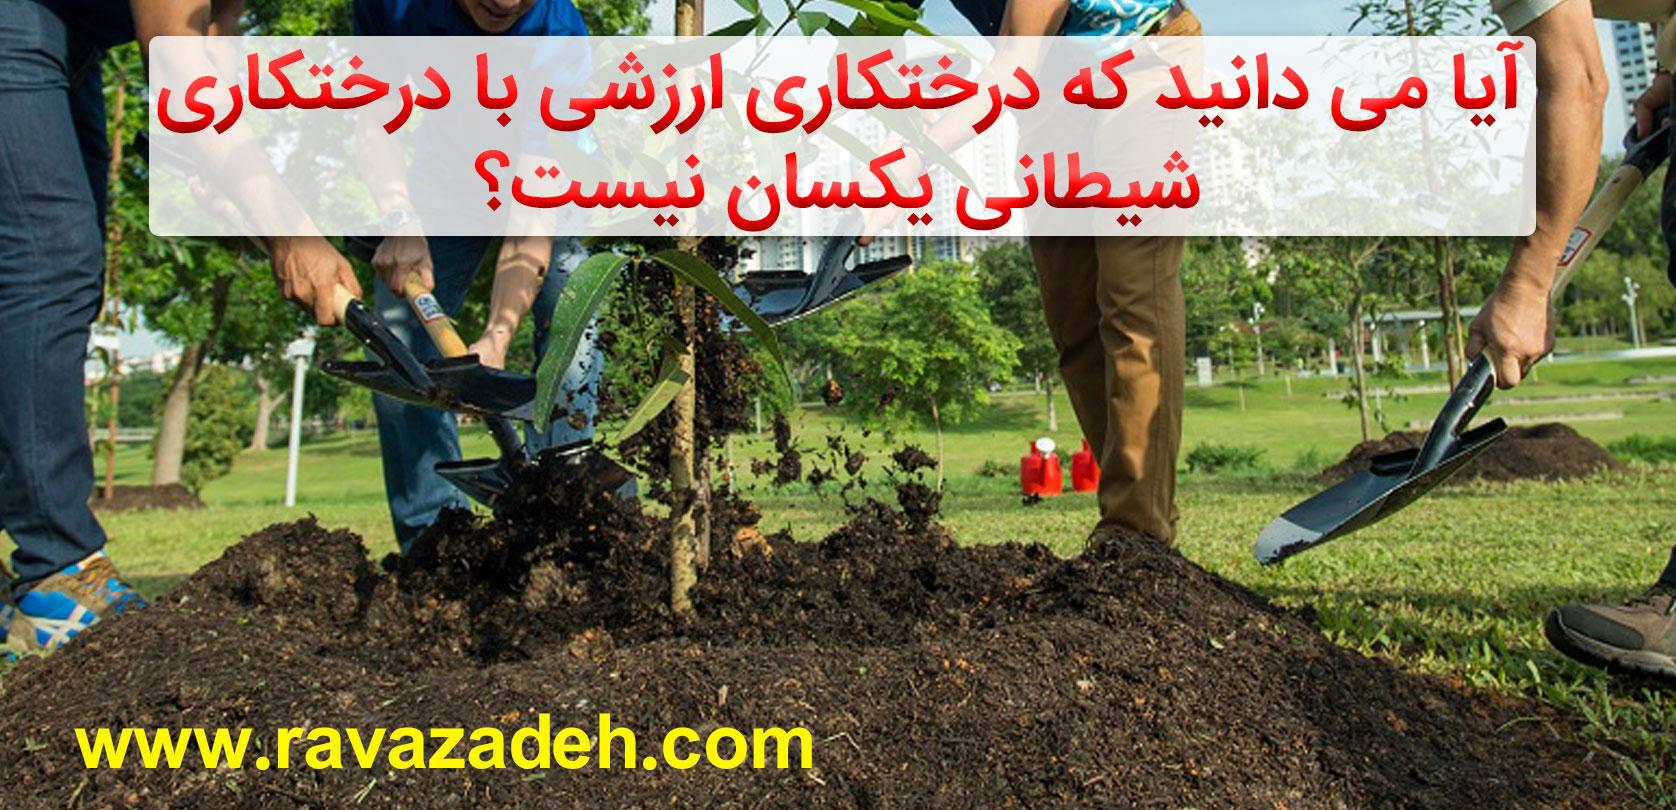 Photo of آیا می دانید که درختکاری ارزشی با درختکاری شیطانی یکسان نیست؟